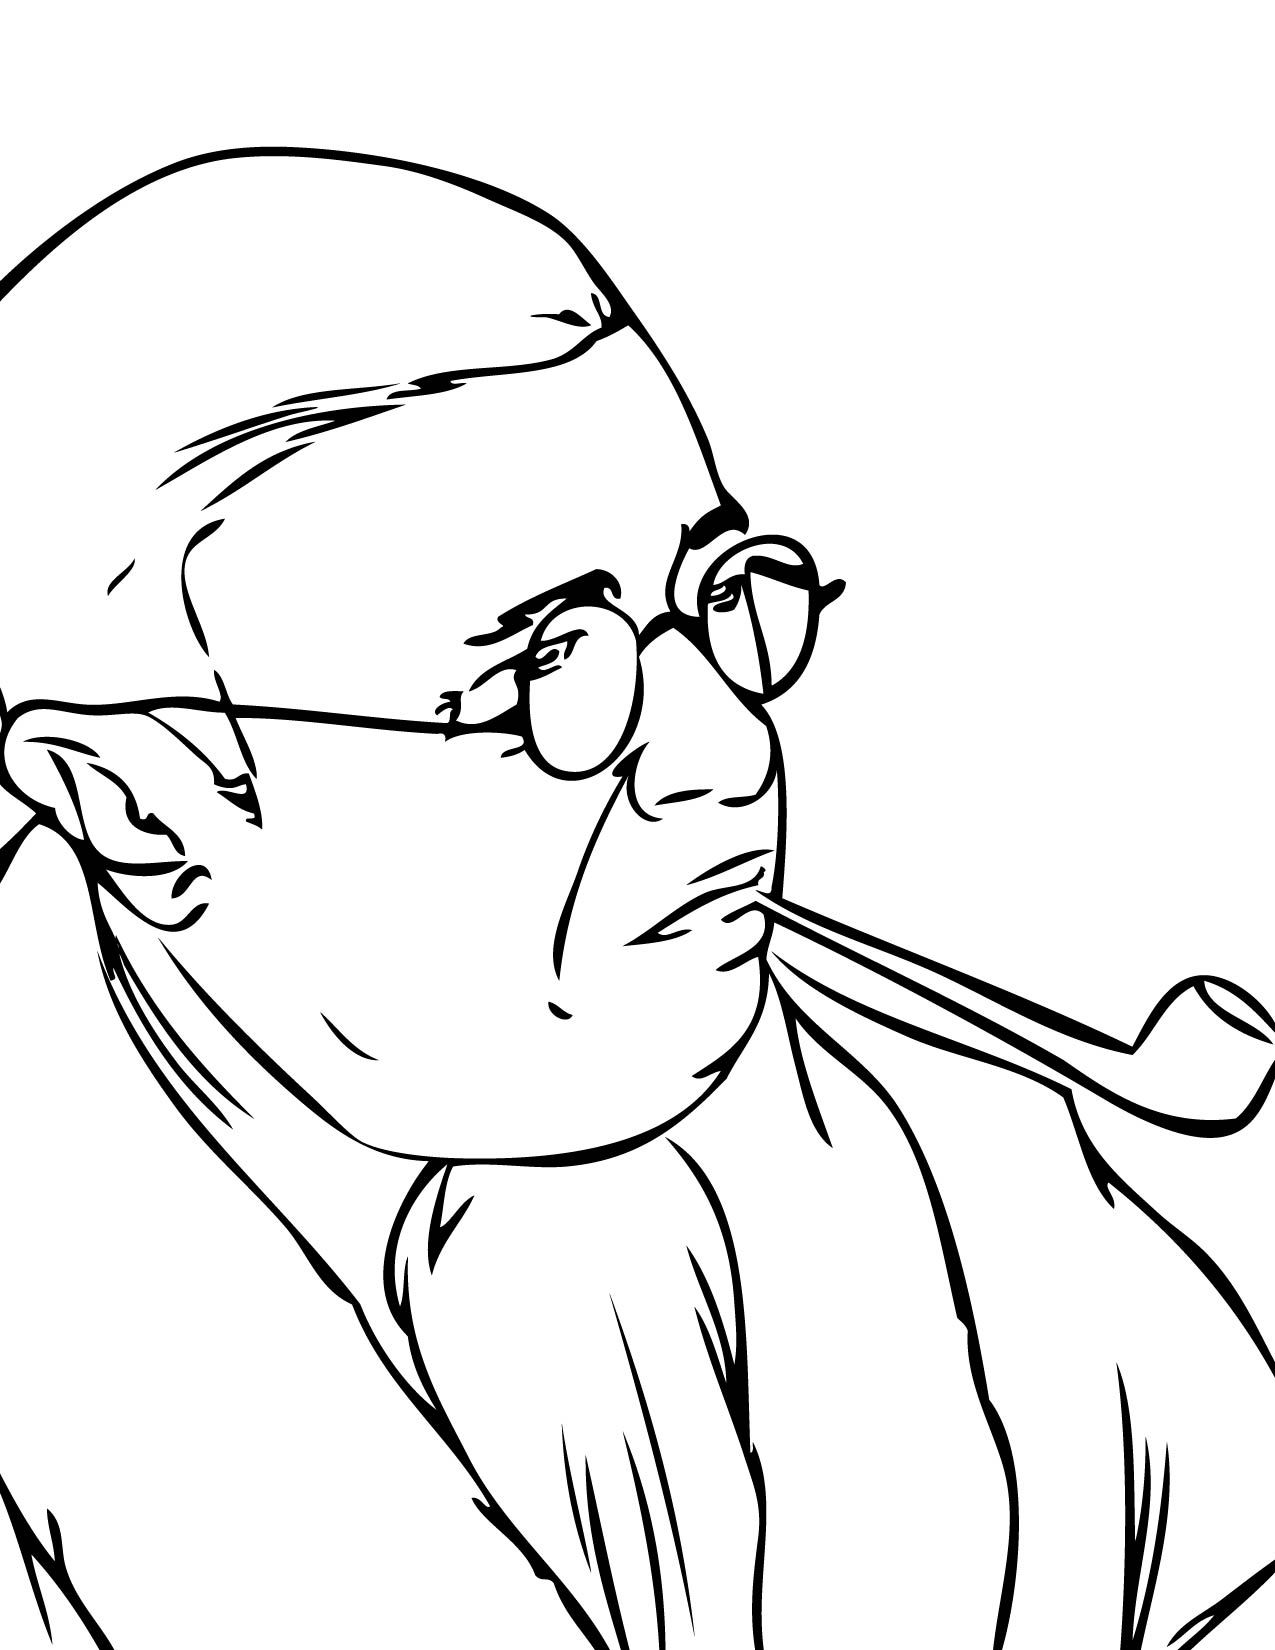 Sartre Coloring Page